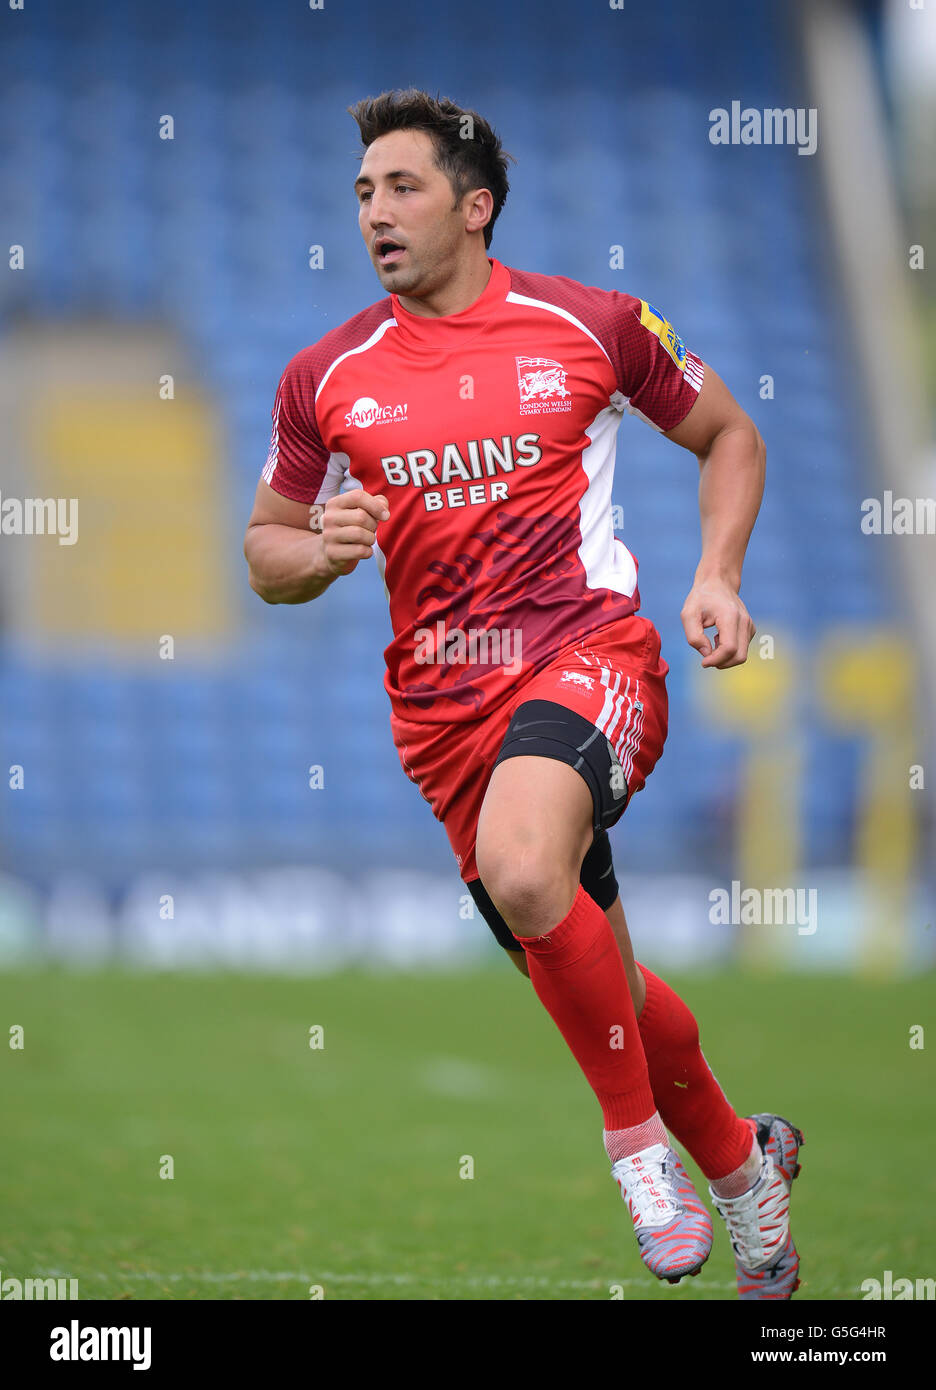 Rugby Union - Aviva Premiership - London Welsh v Saracens - Kassam Stadium - Stock Image